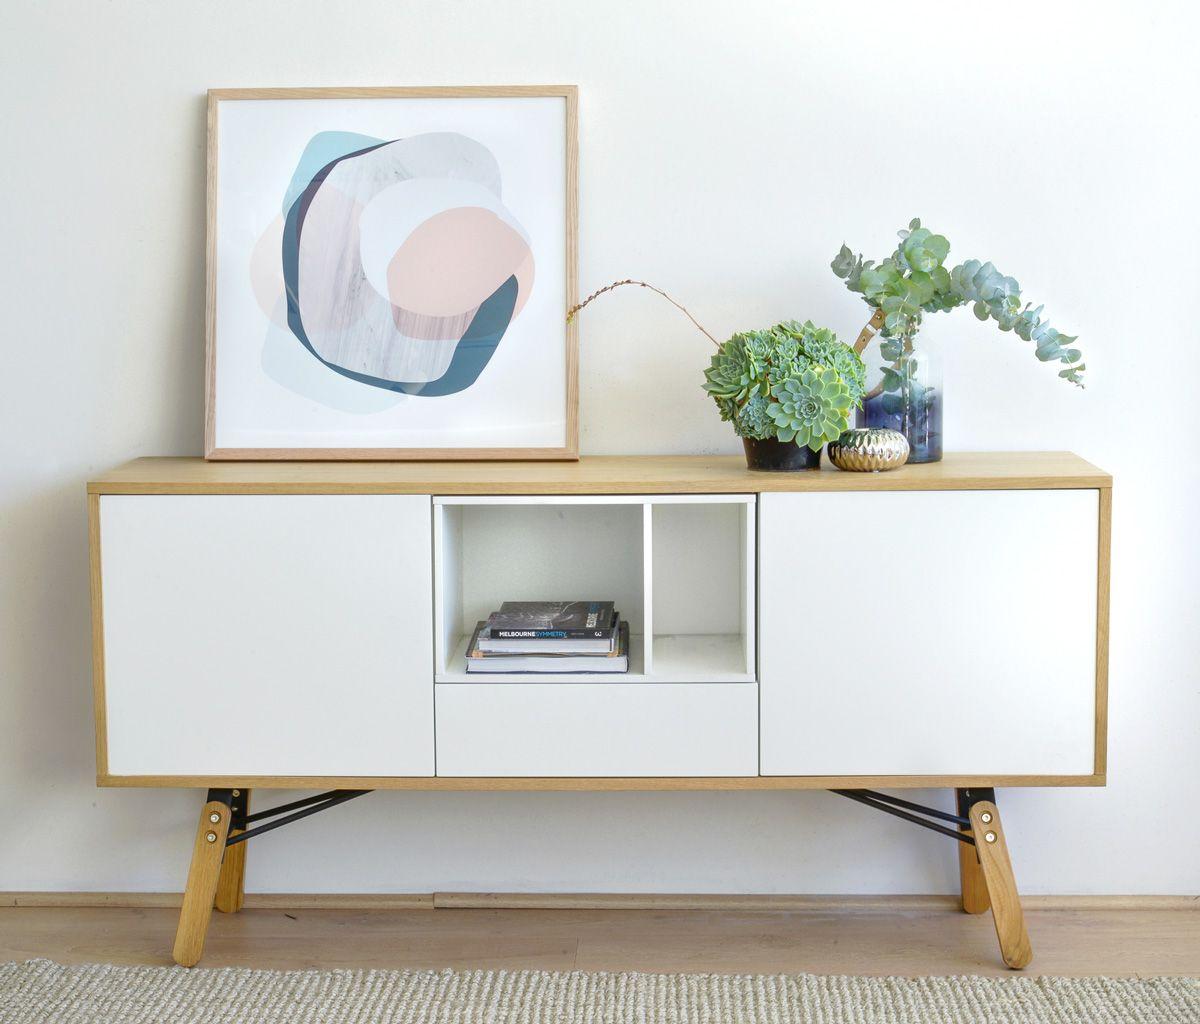 Zeno Scandinavian Sideboard Buffet Cabinet Interior Secrets Sideboard Styles Scandinavian Style Furniture Scandinavian Style Sideboard